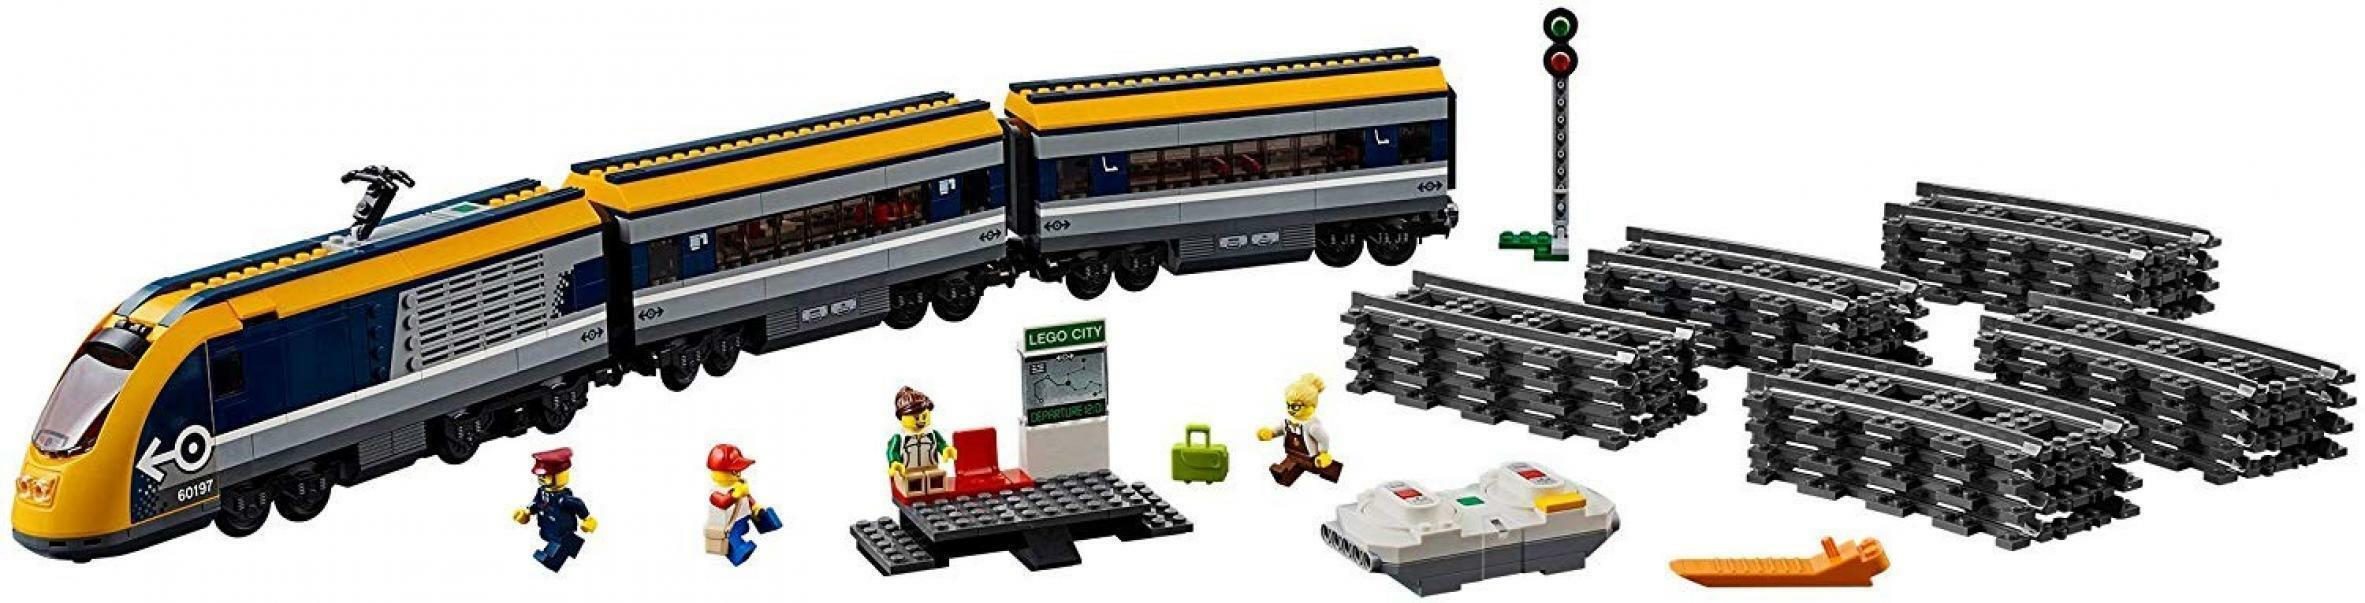 lego lego city 60197 - treno passeggeri